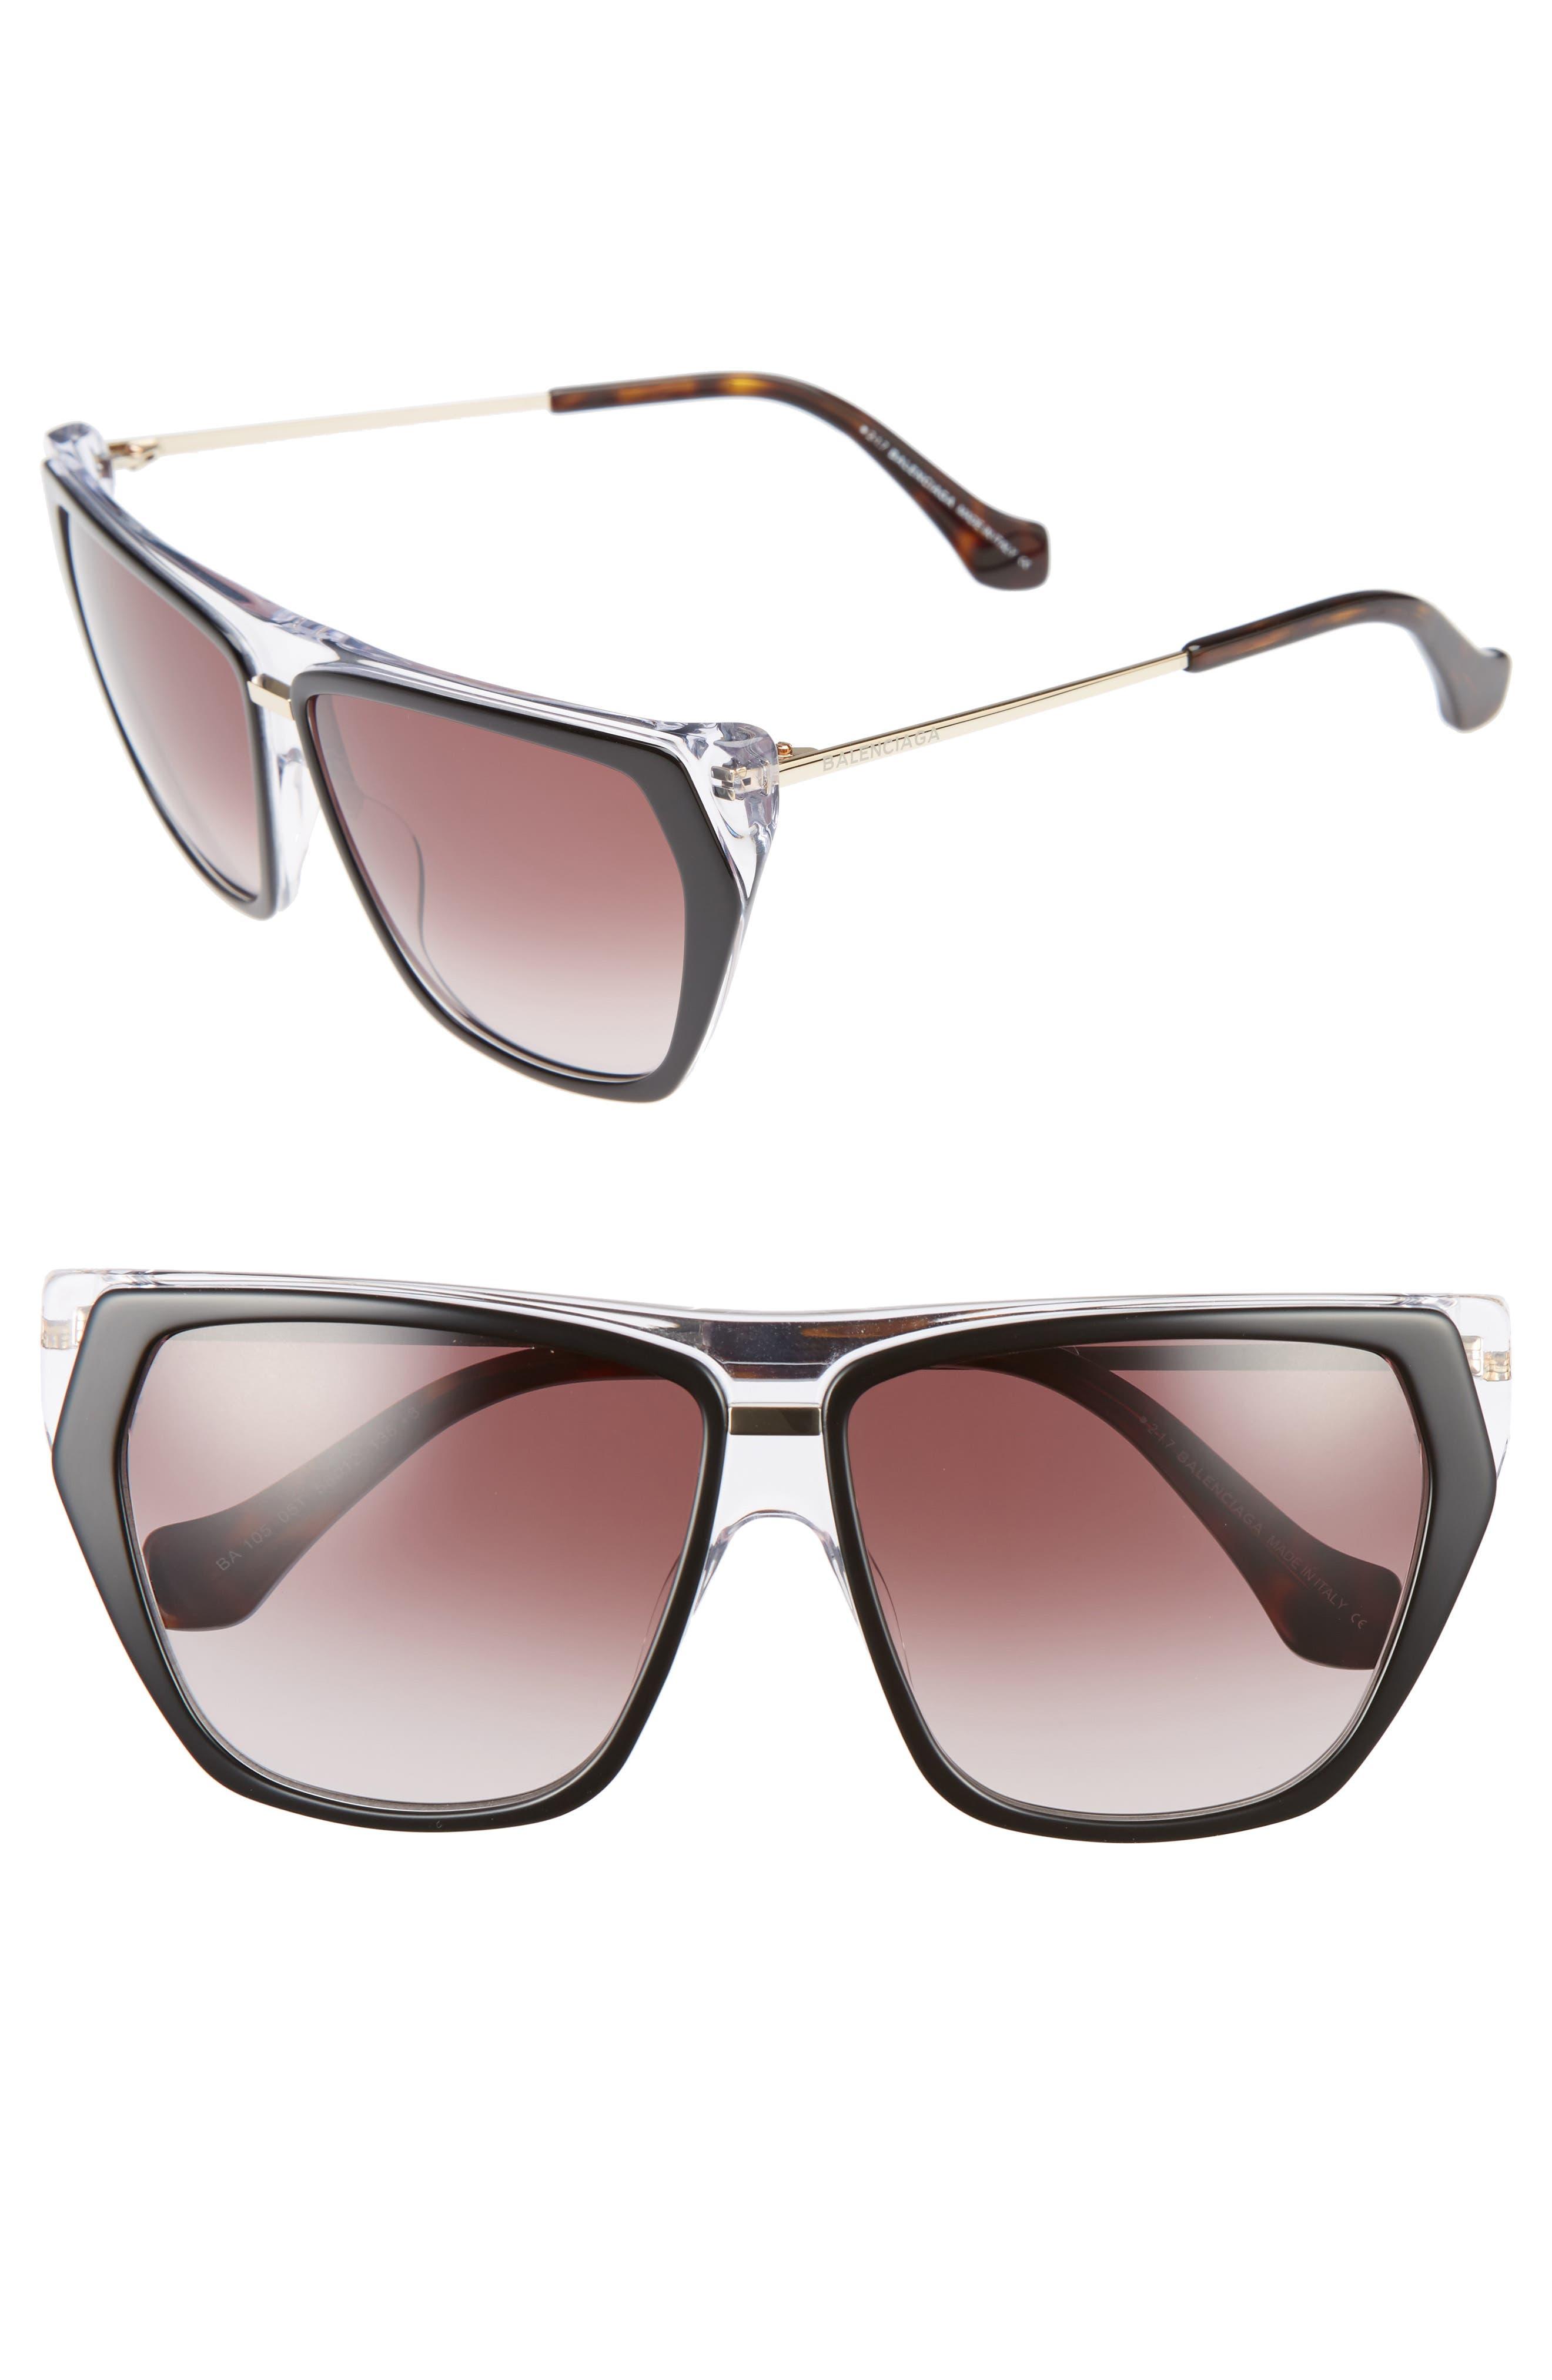 Main Image - Balenciaga 58mm Gradient Sunglasses